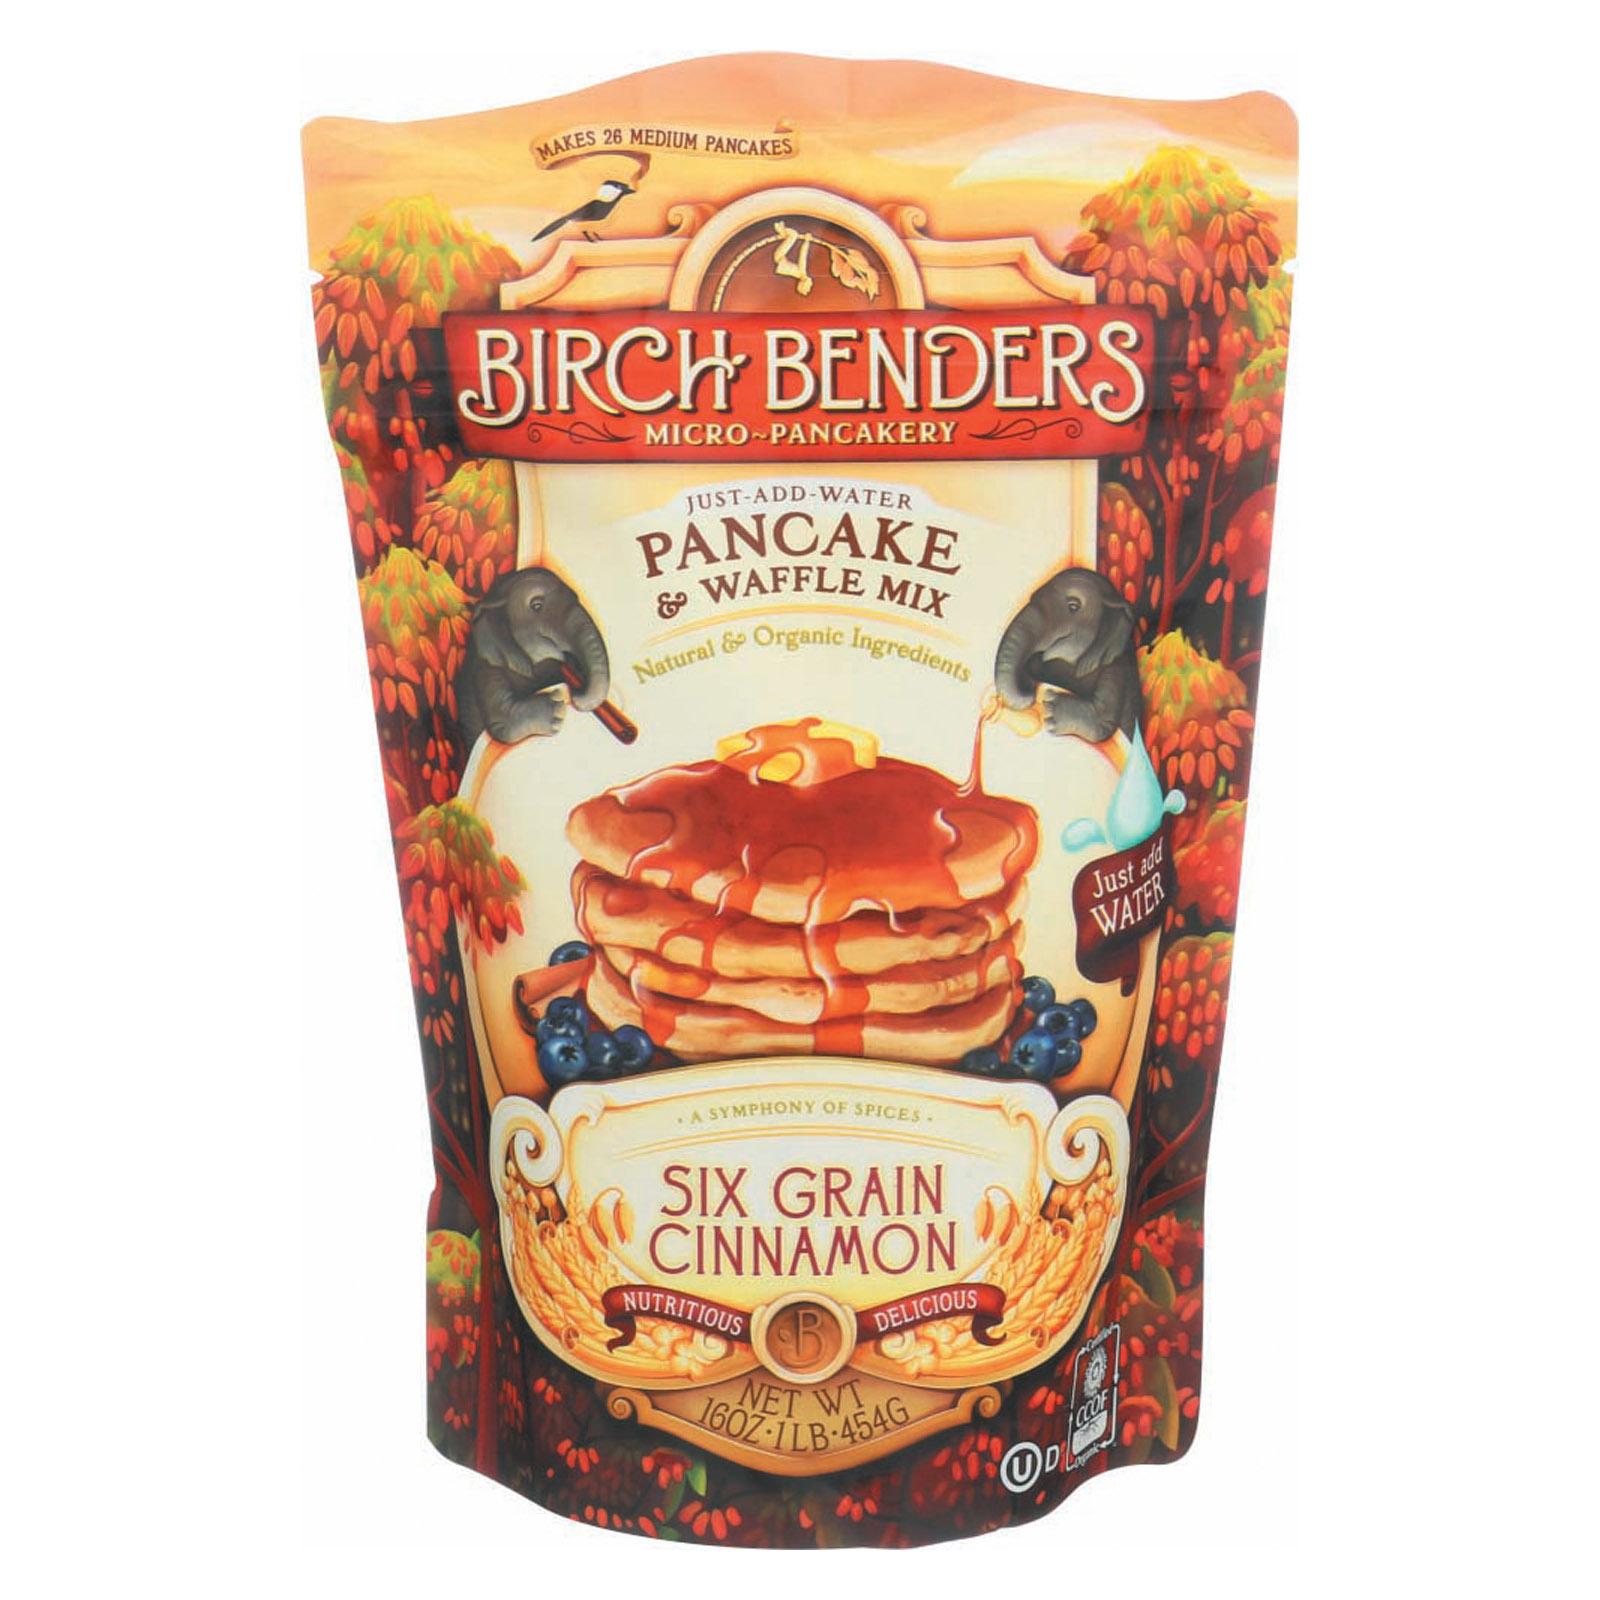 Birch Benders Pancake and Waffle Mix - Six Grain Cinnamon - Case of 6 - 16 oz.